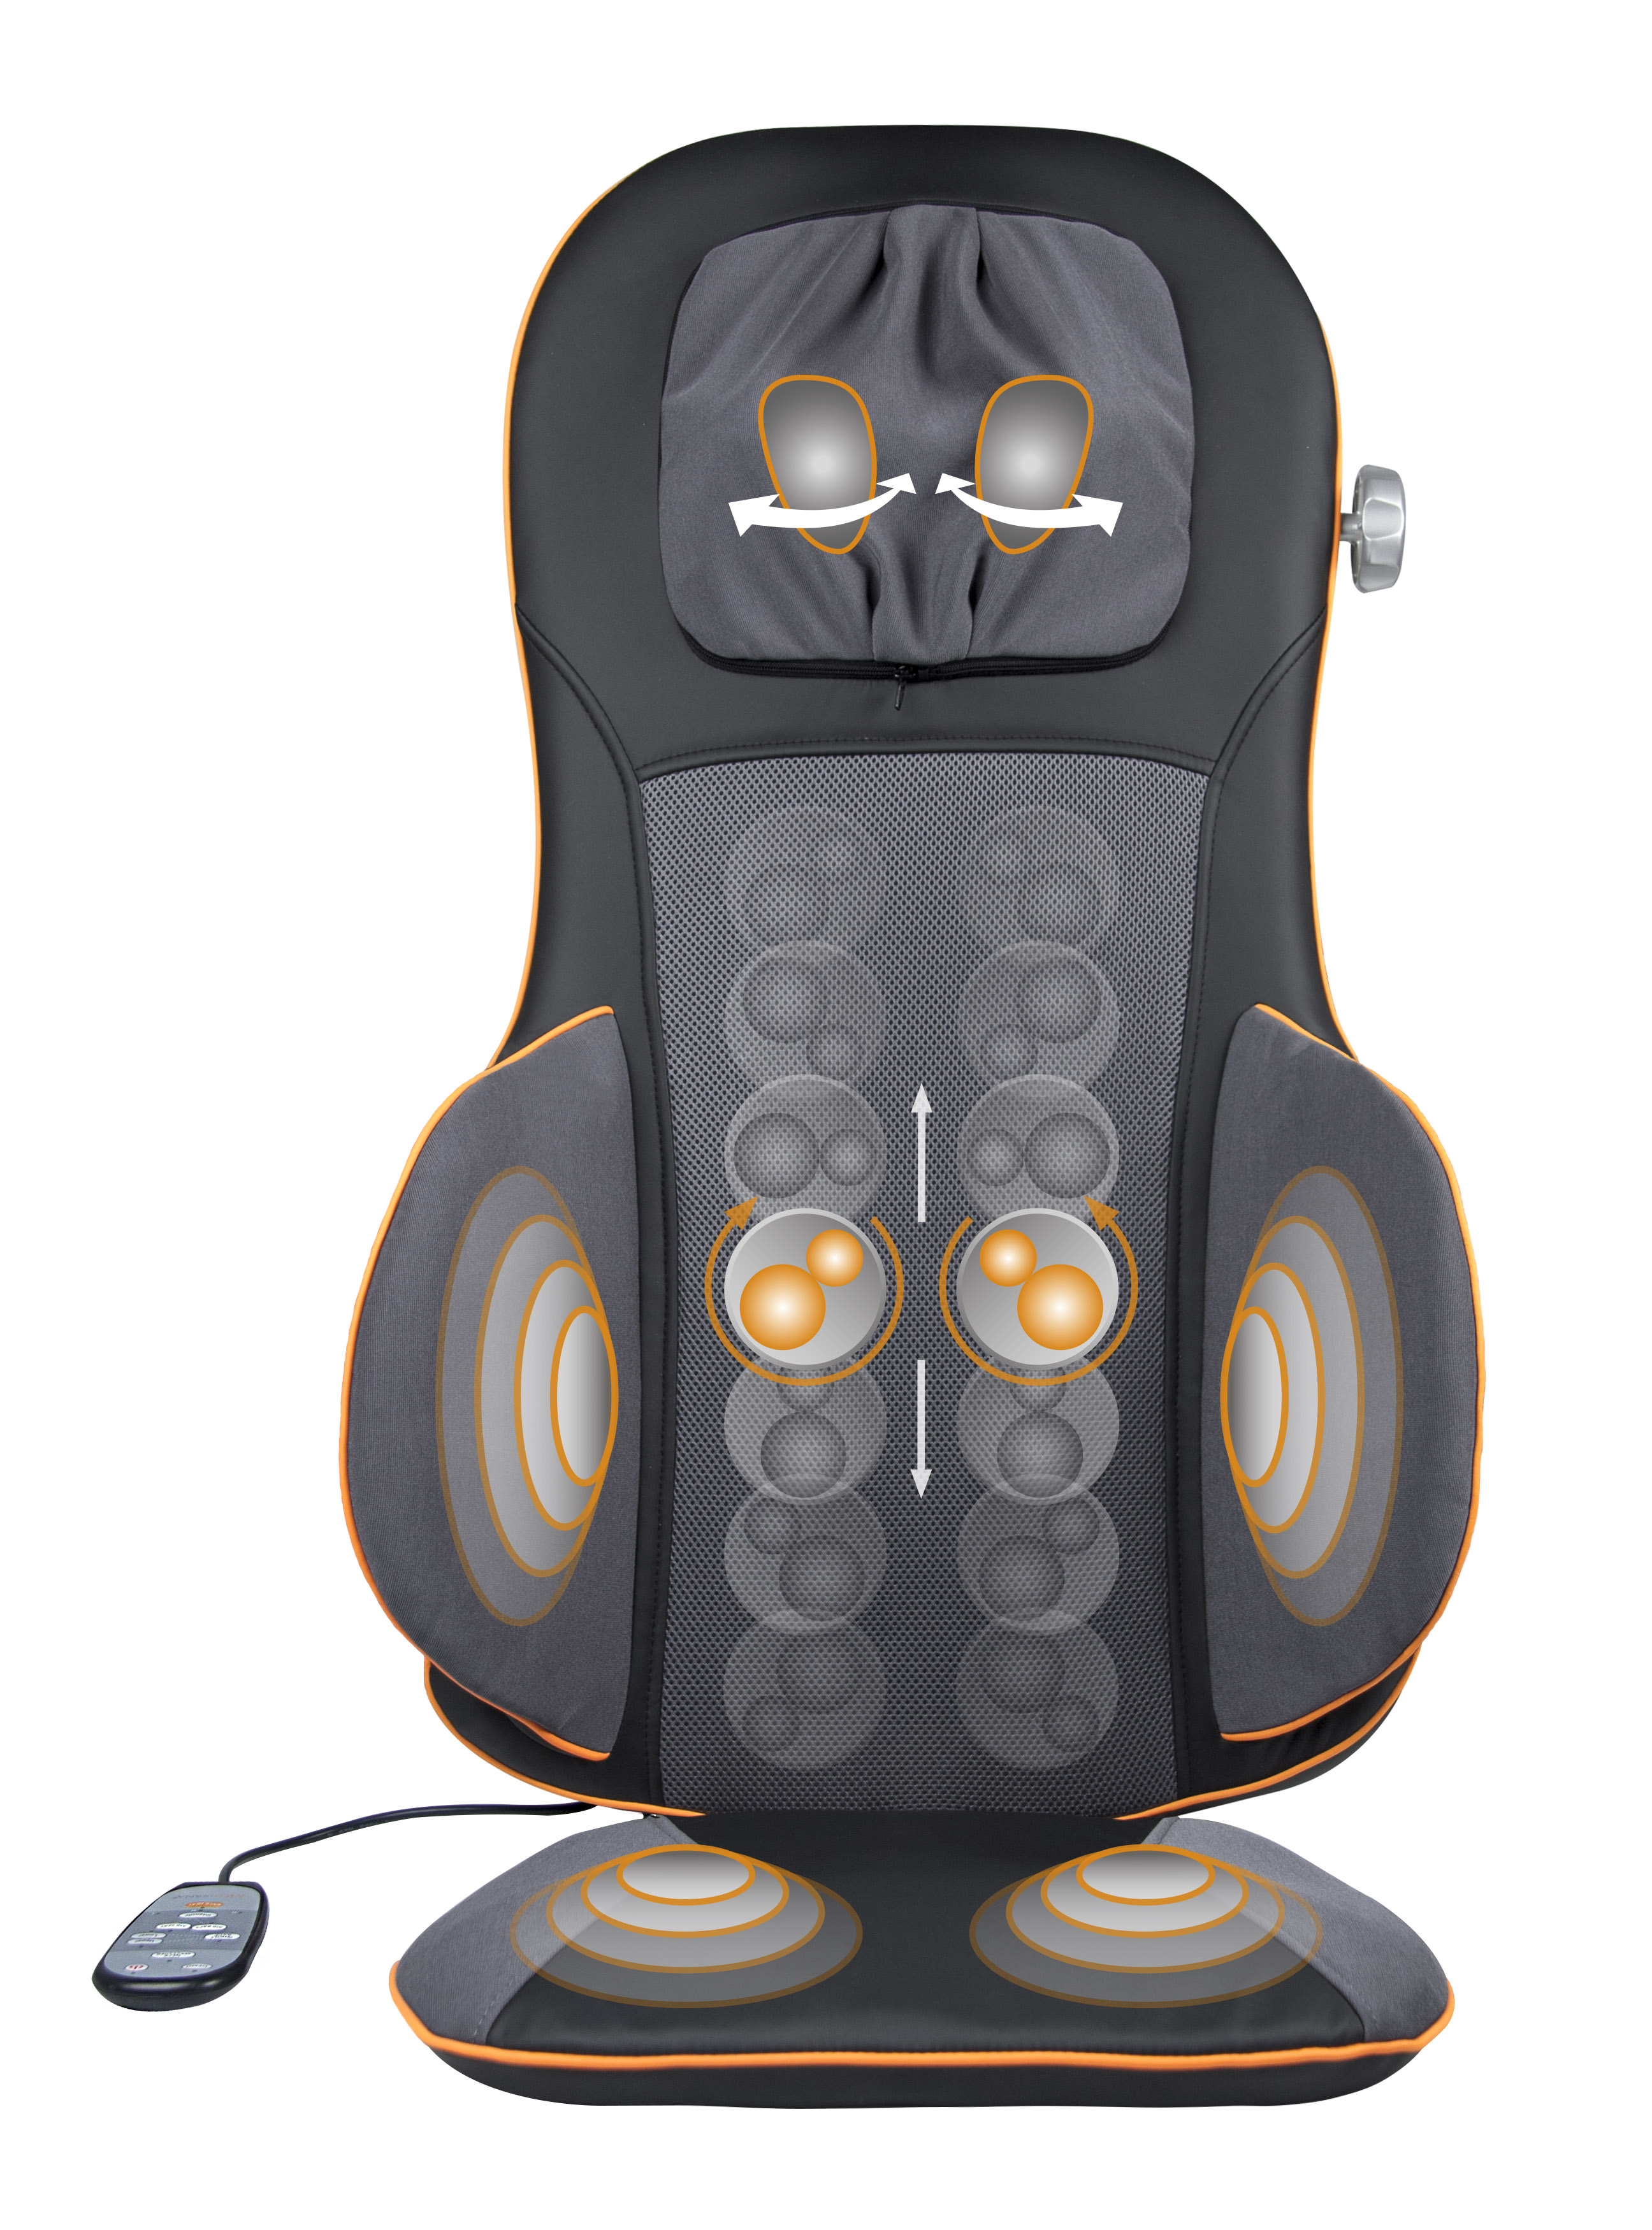 Masážní sedačka Medisana MC 825 Shiatsu